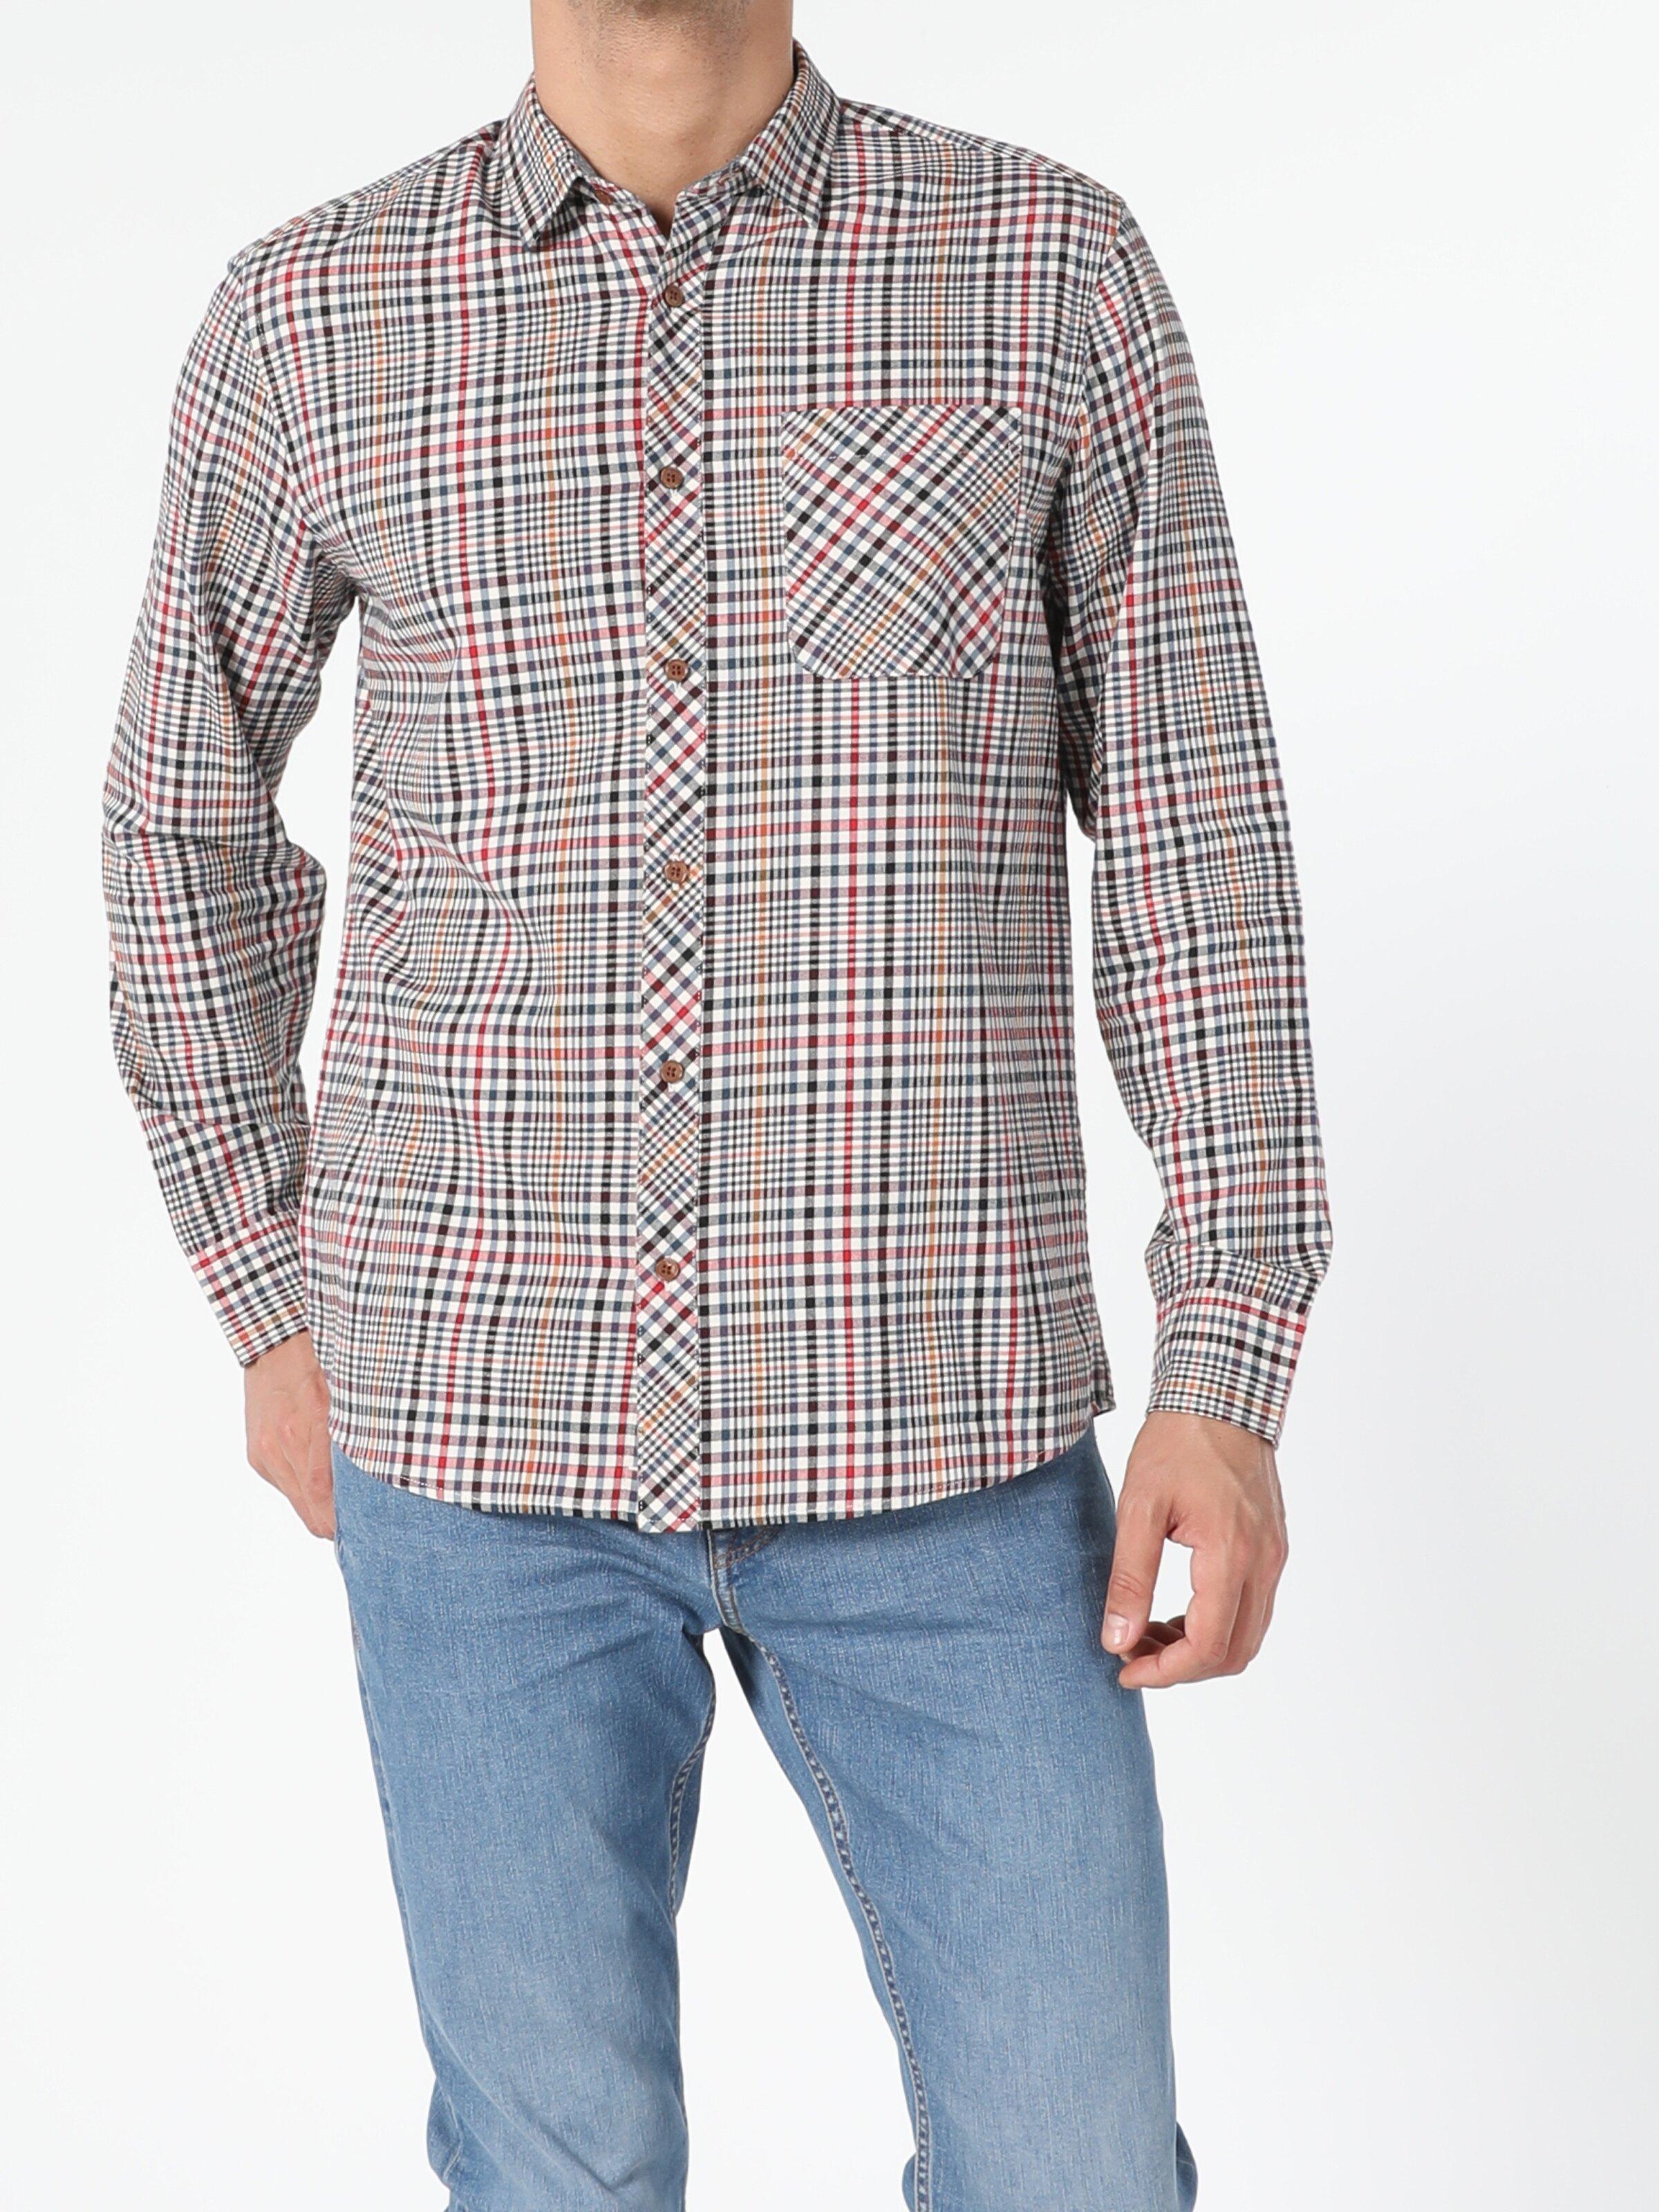 Regular Fit Erkek Uzun Kol Gömlek